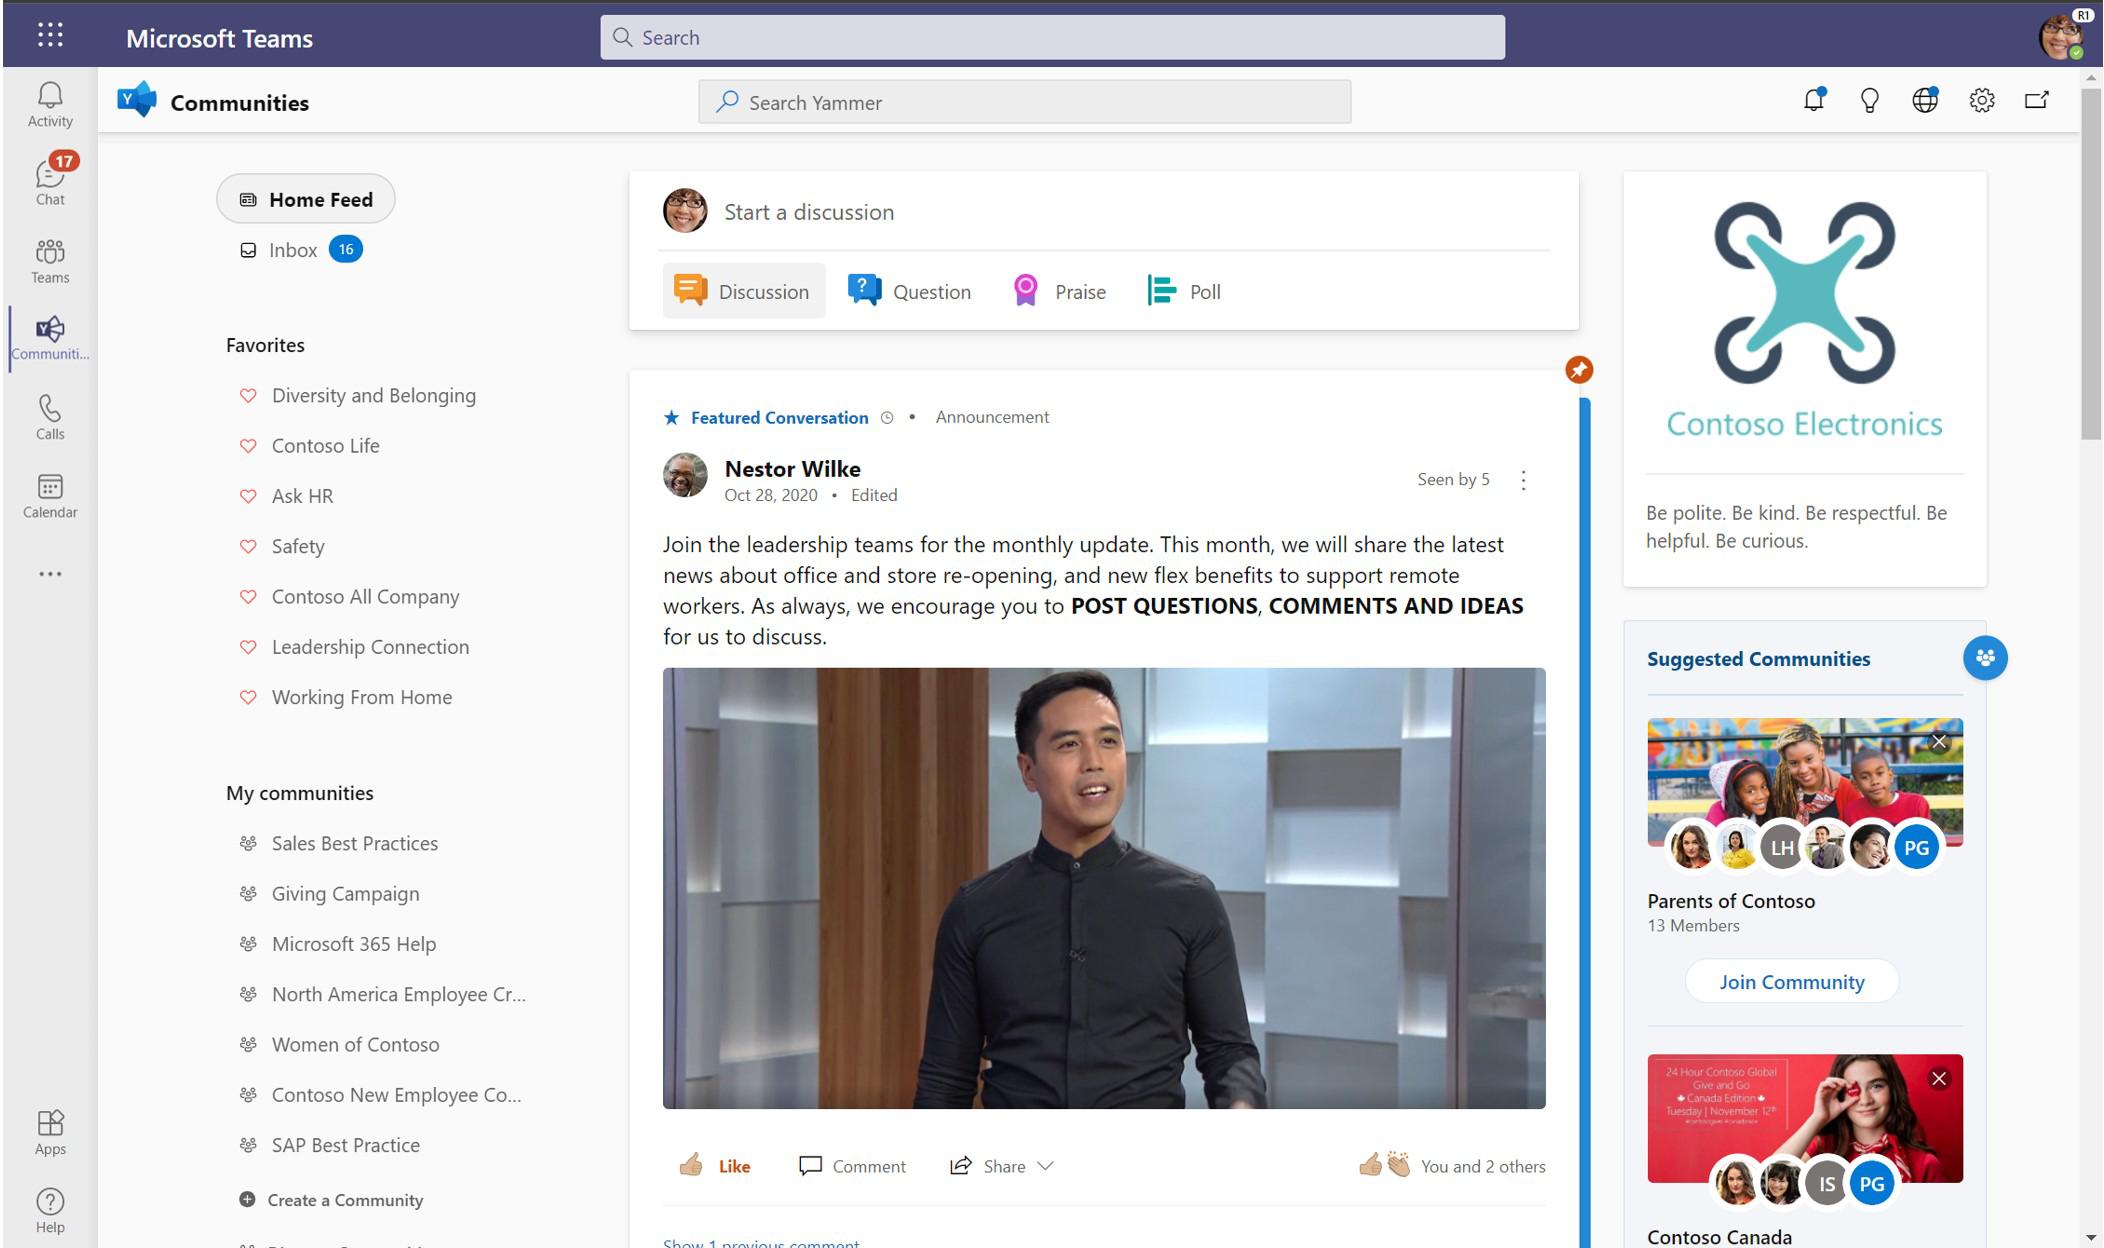 Teams の [コミュニティ] アプリYammerビューを示すスクリーンショット